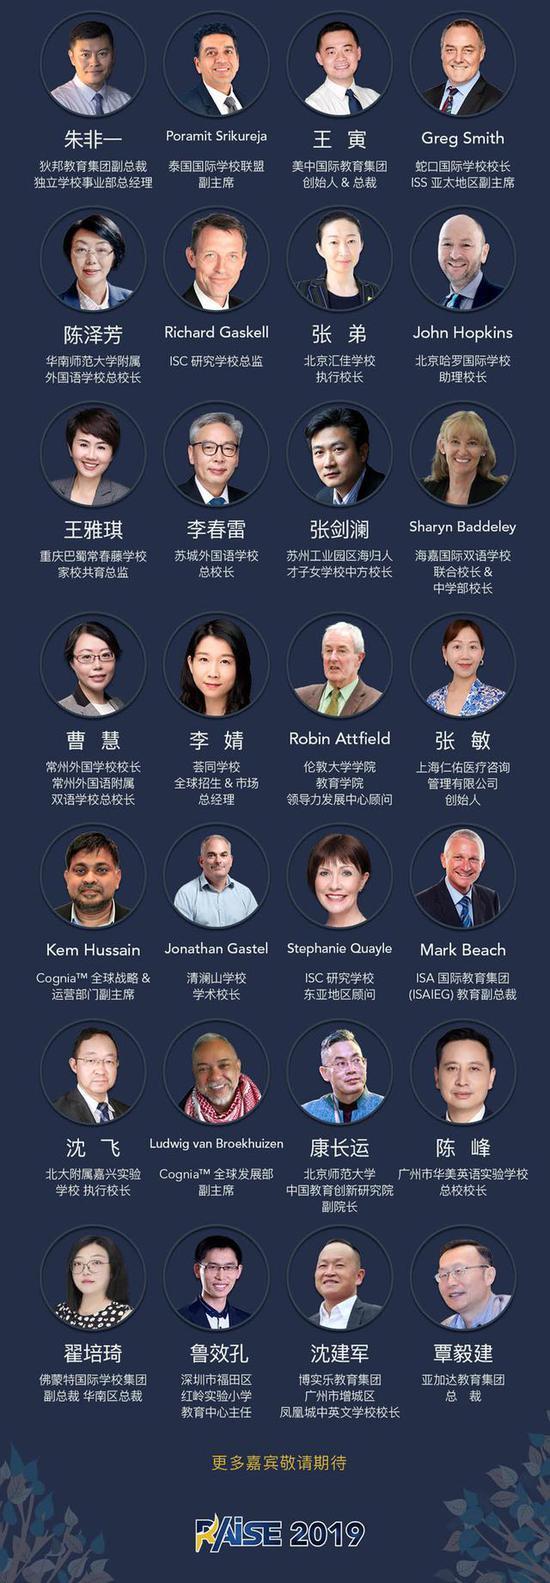 RAISE2019亚洲国际学校大会最全嘉宾及参会指南发